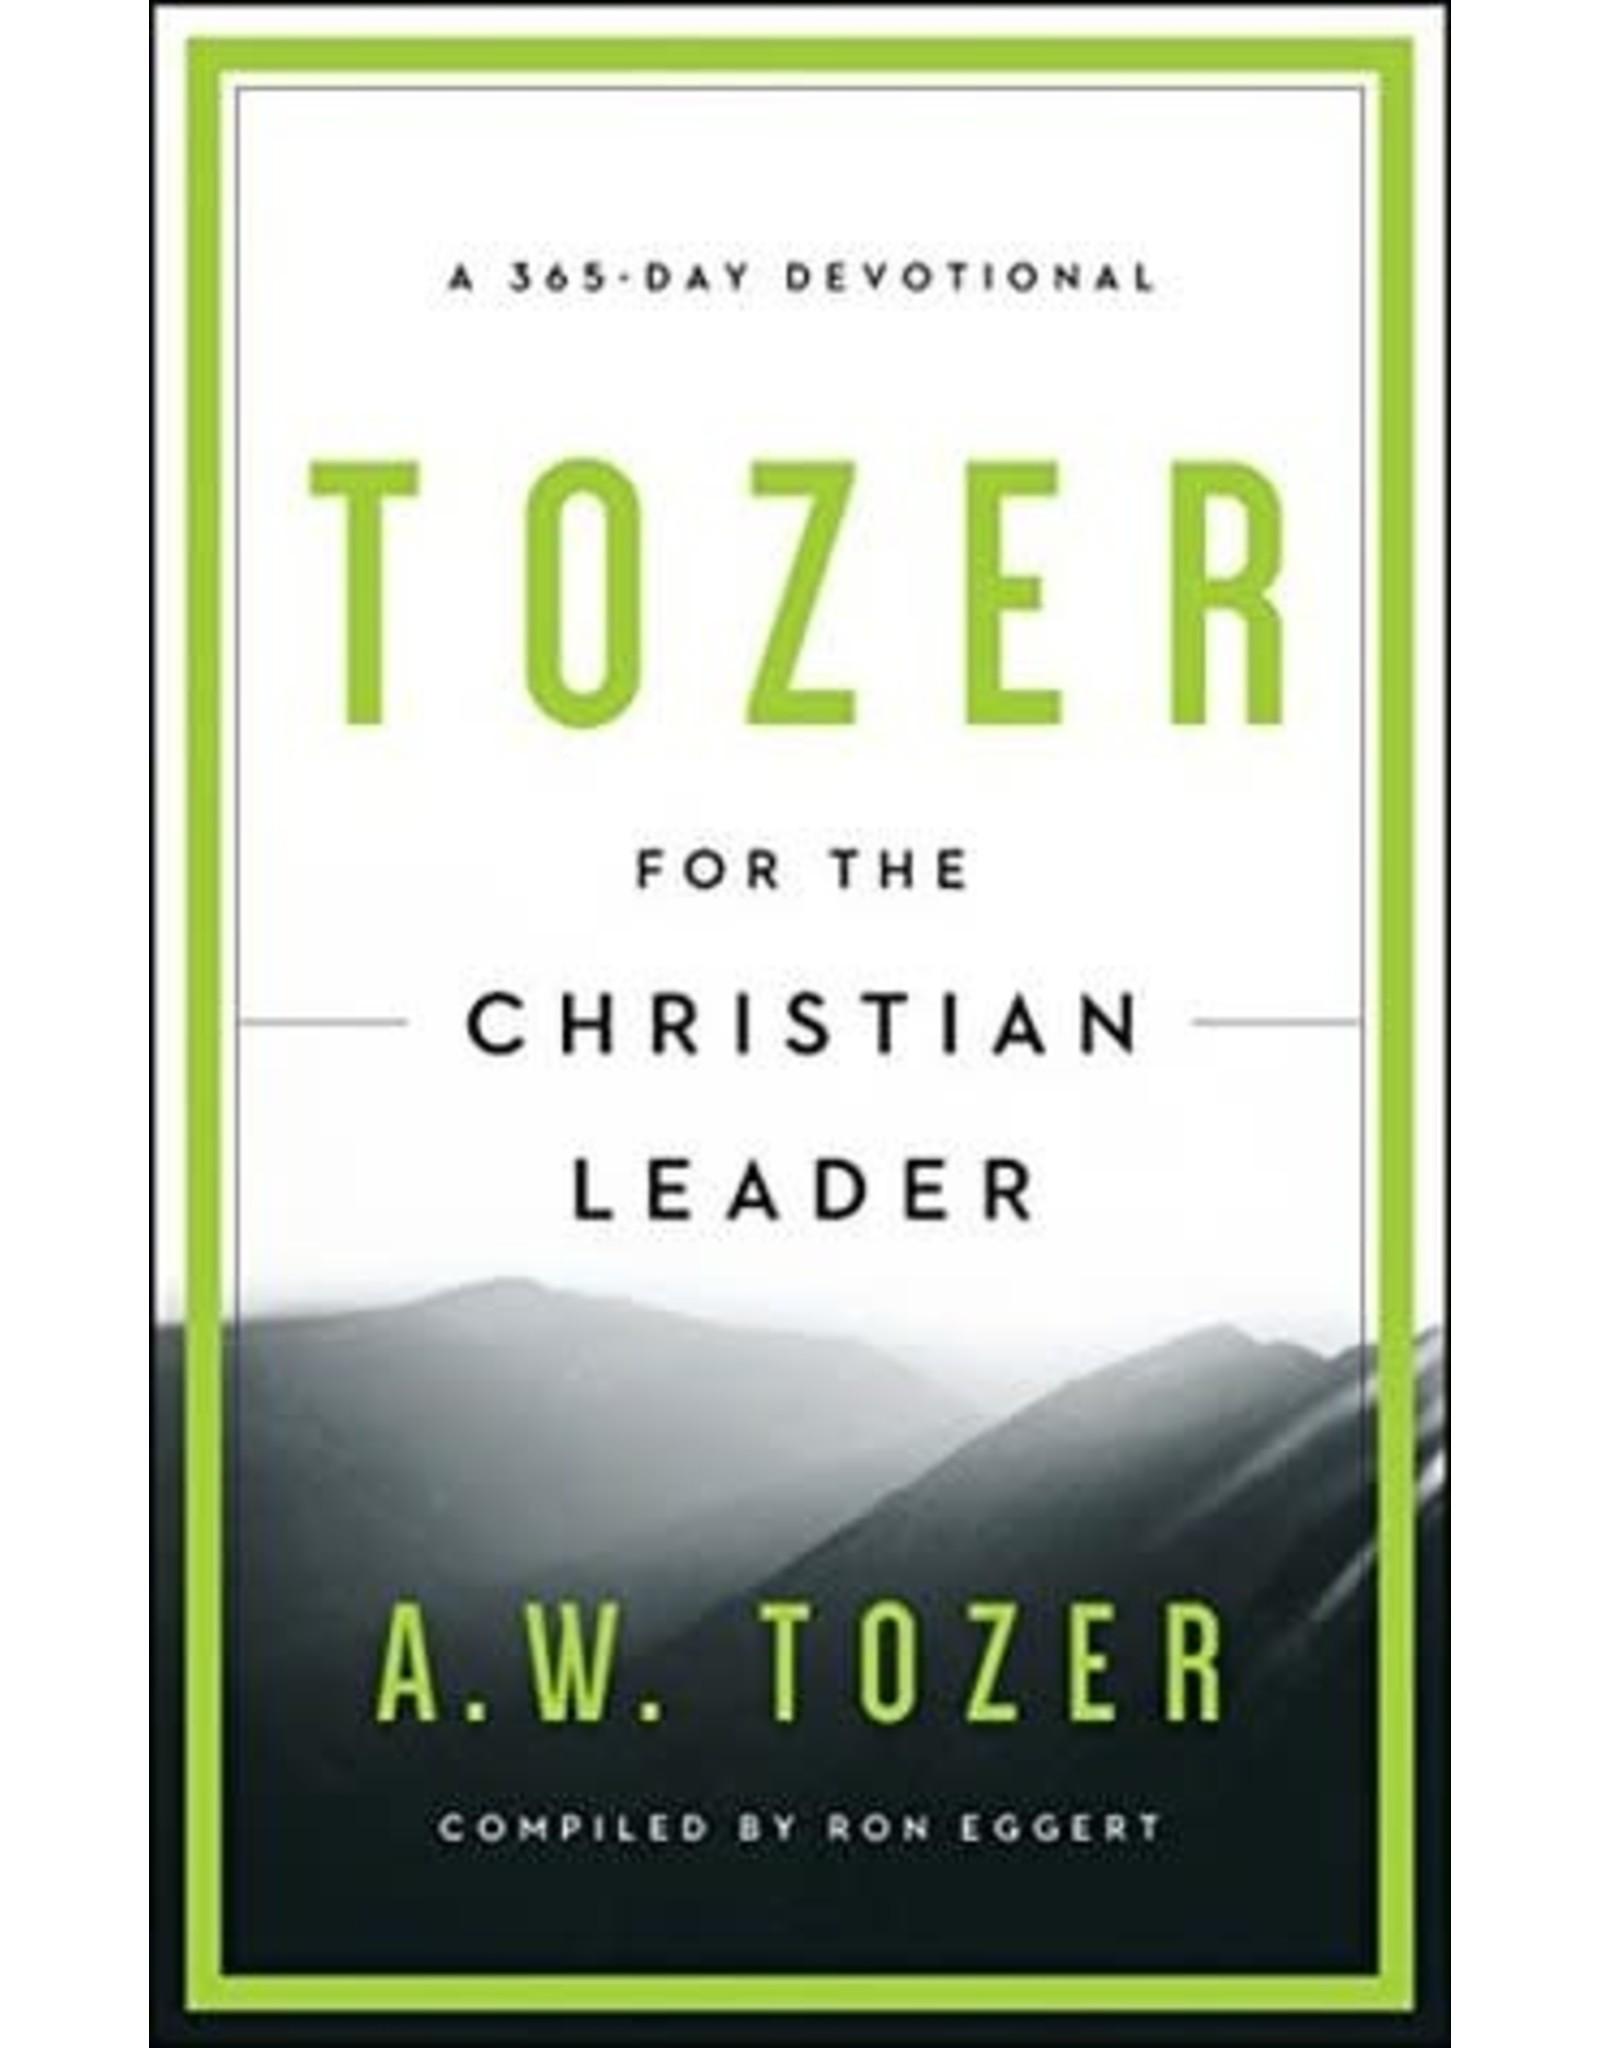 Tozer Tozer For the Christian Leader